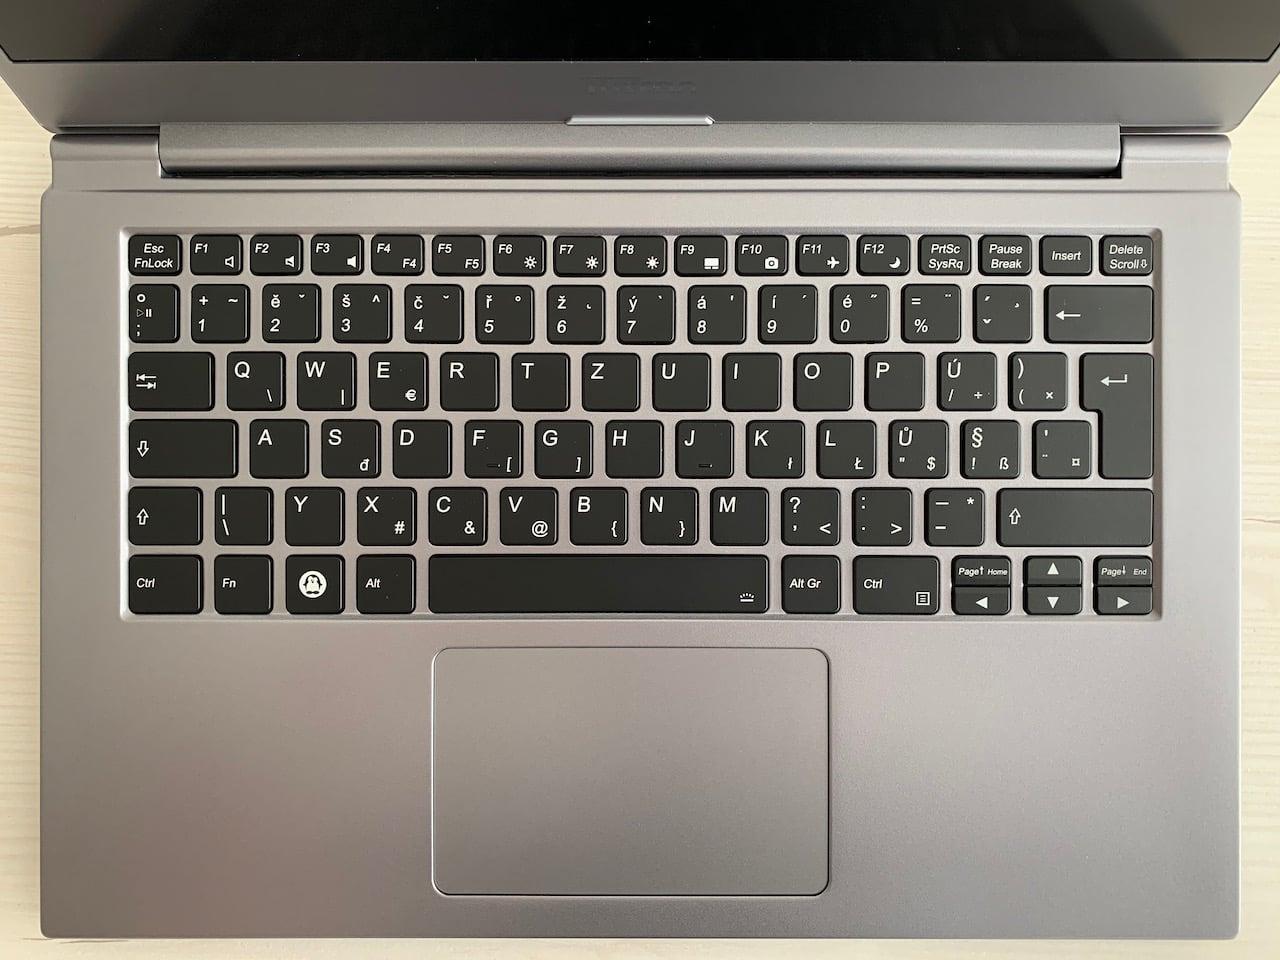 Tuxedo InfinityBook S14 v5